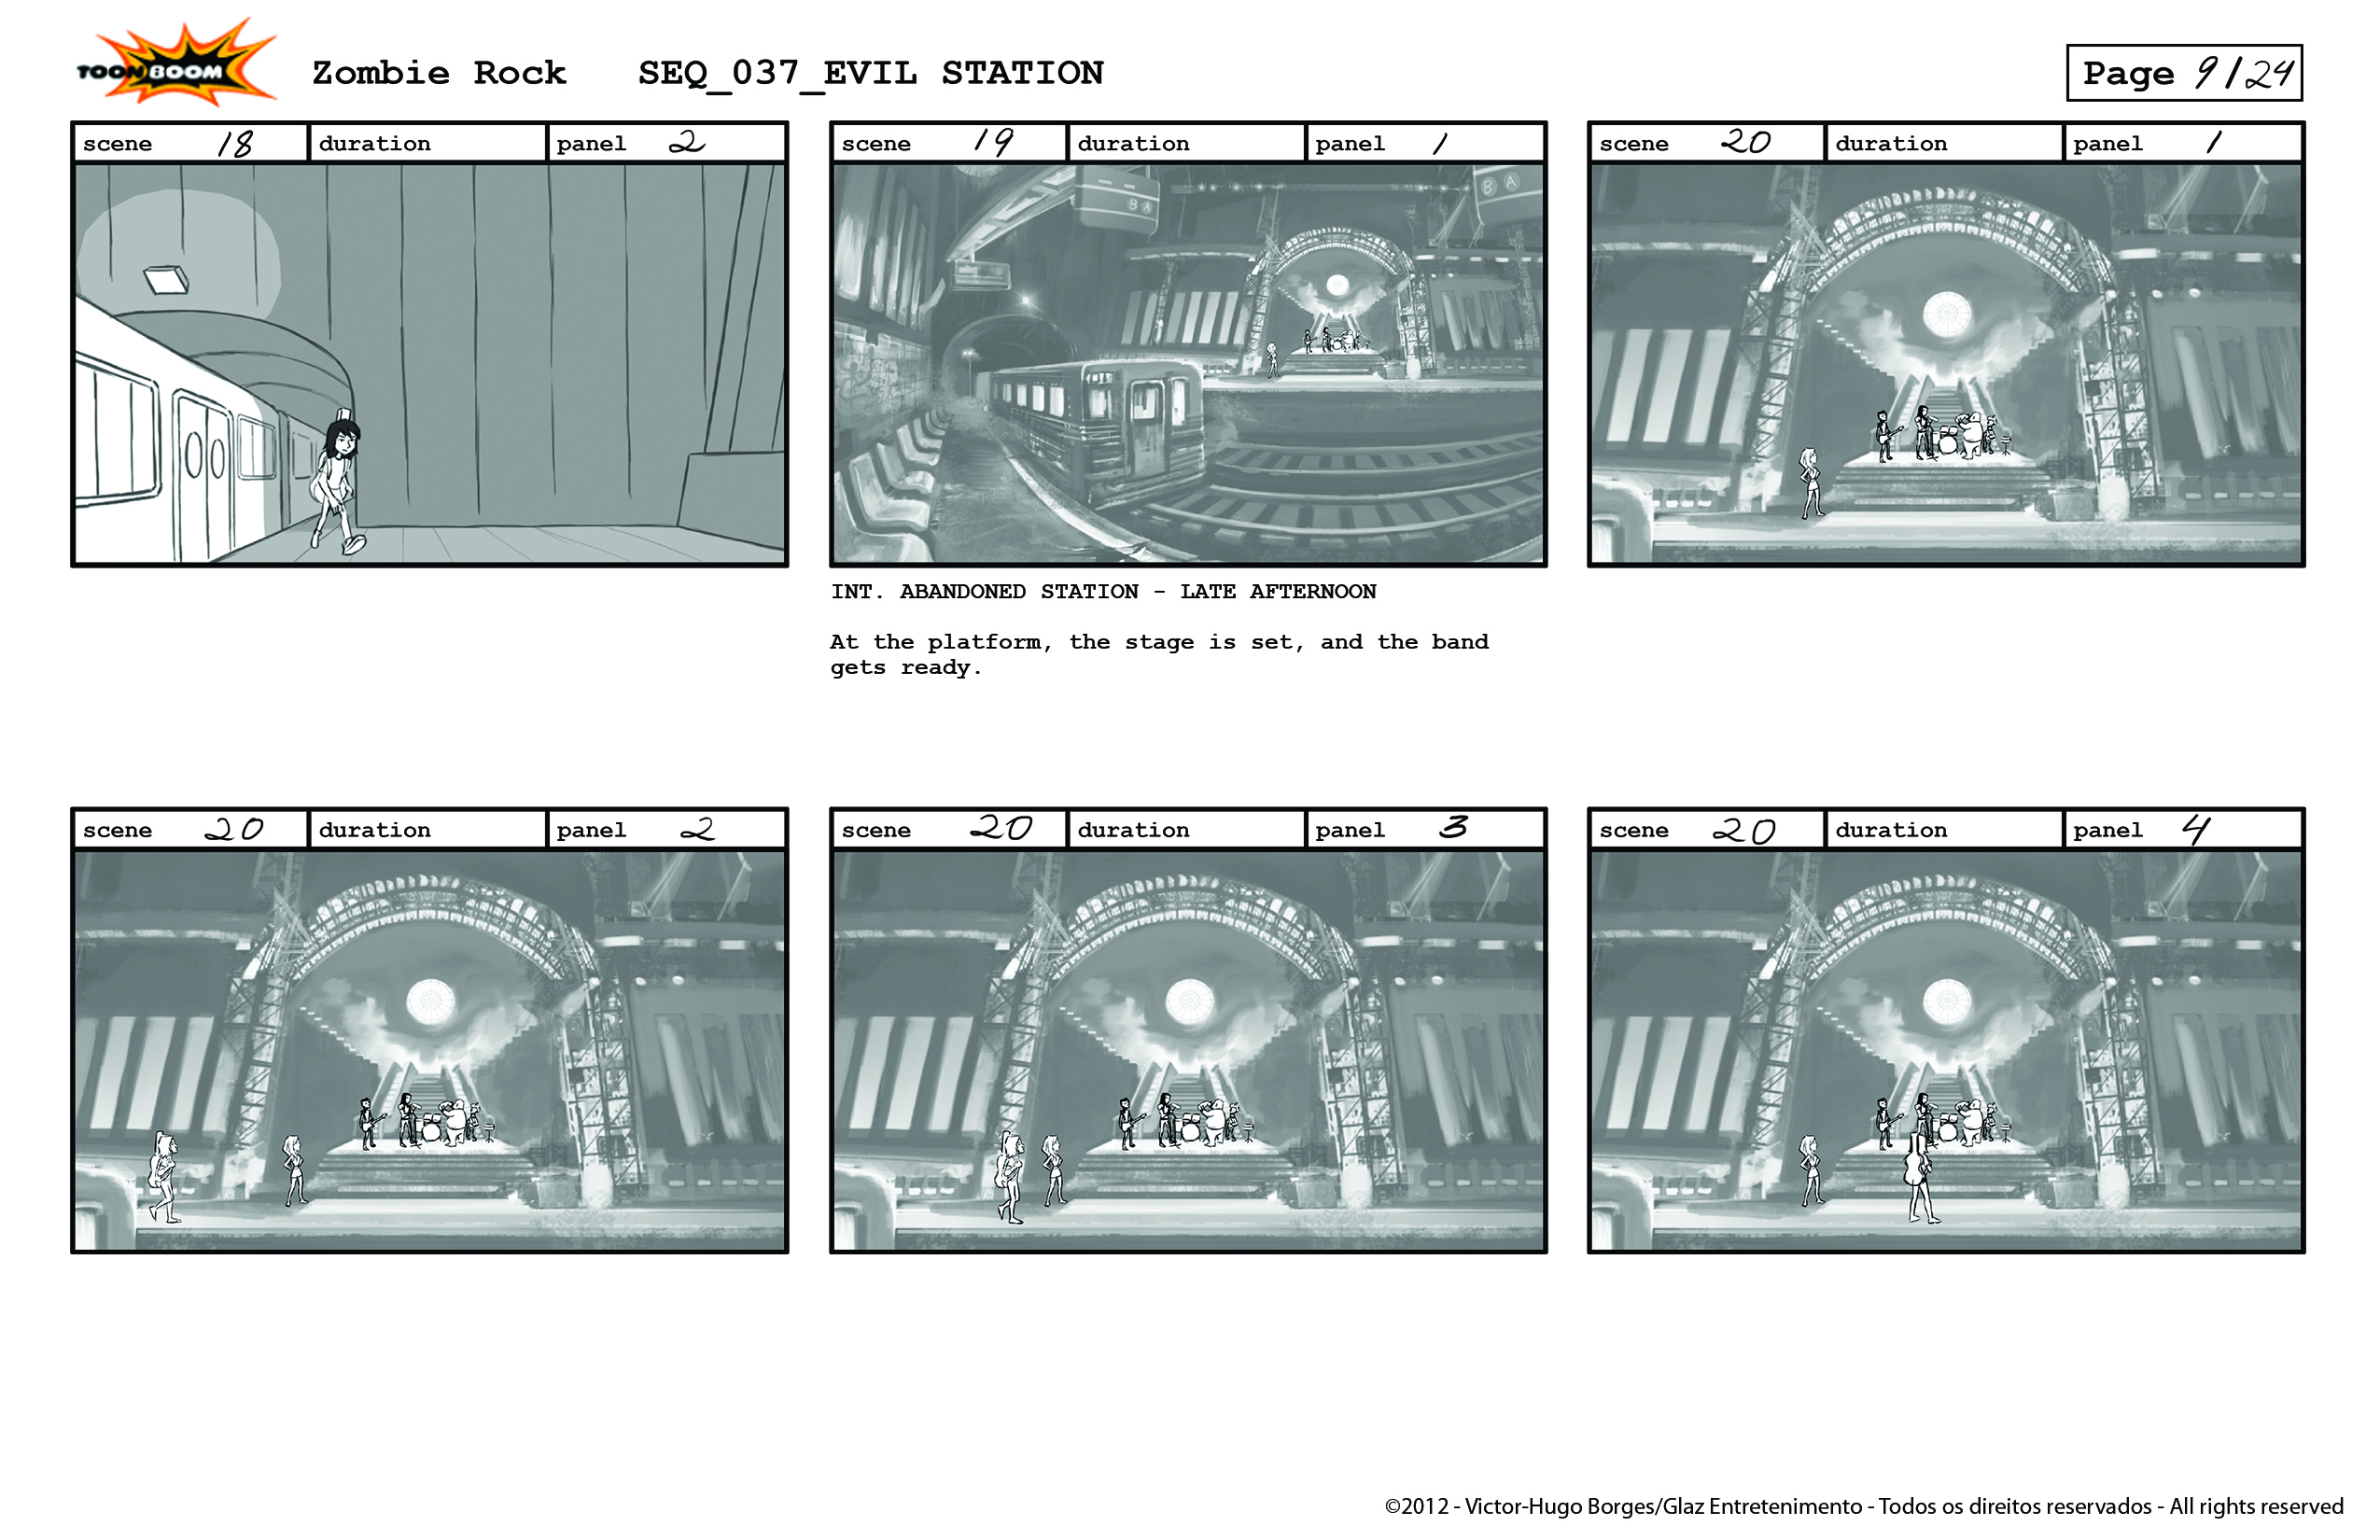 SEQ037_Evil Station_page09